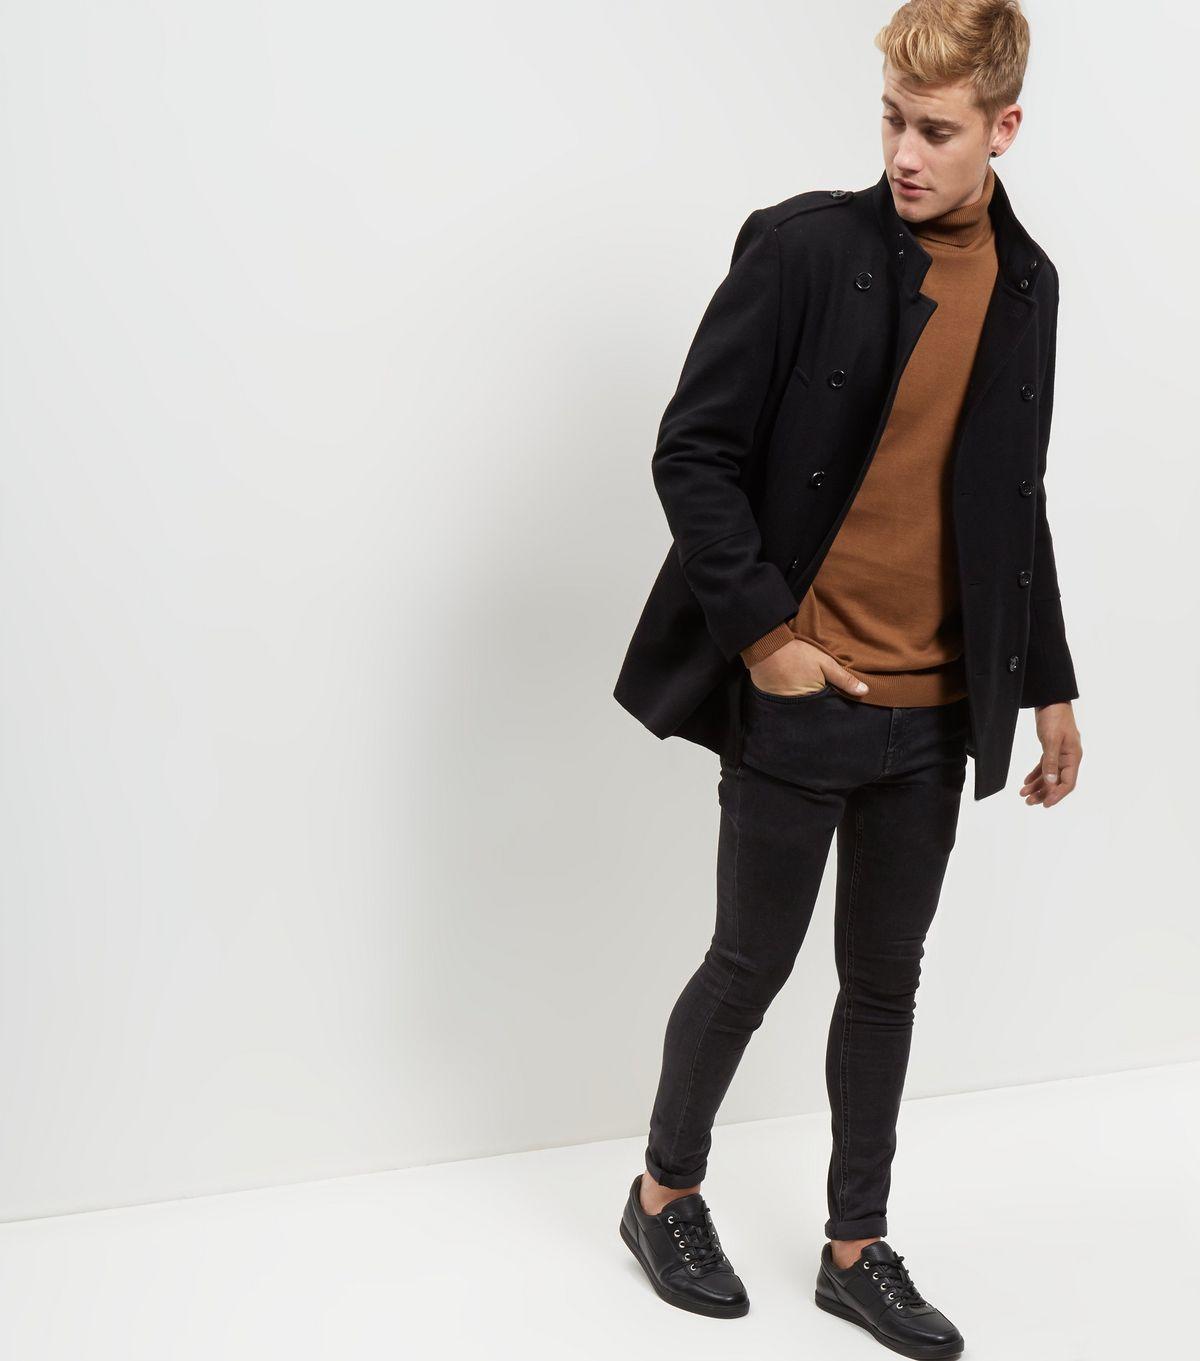 http://media.newlookassets.com/i/newlook/372301301D1/mens/jackets-and-coats/coats/black-military-jacket-/?$new_pdp_szoom_image_1200$